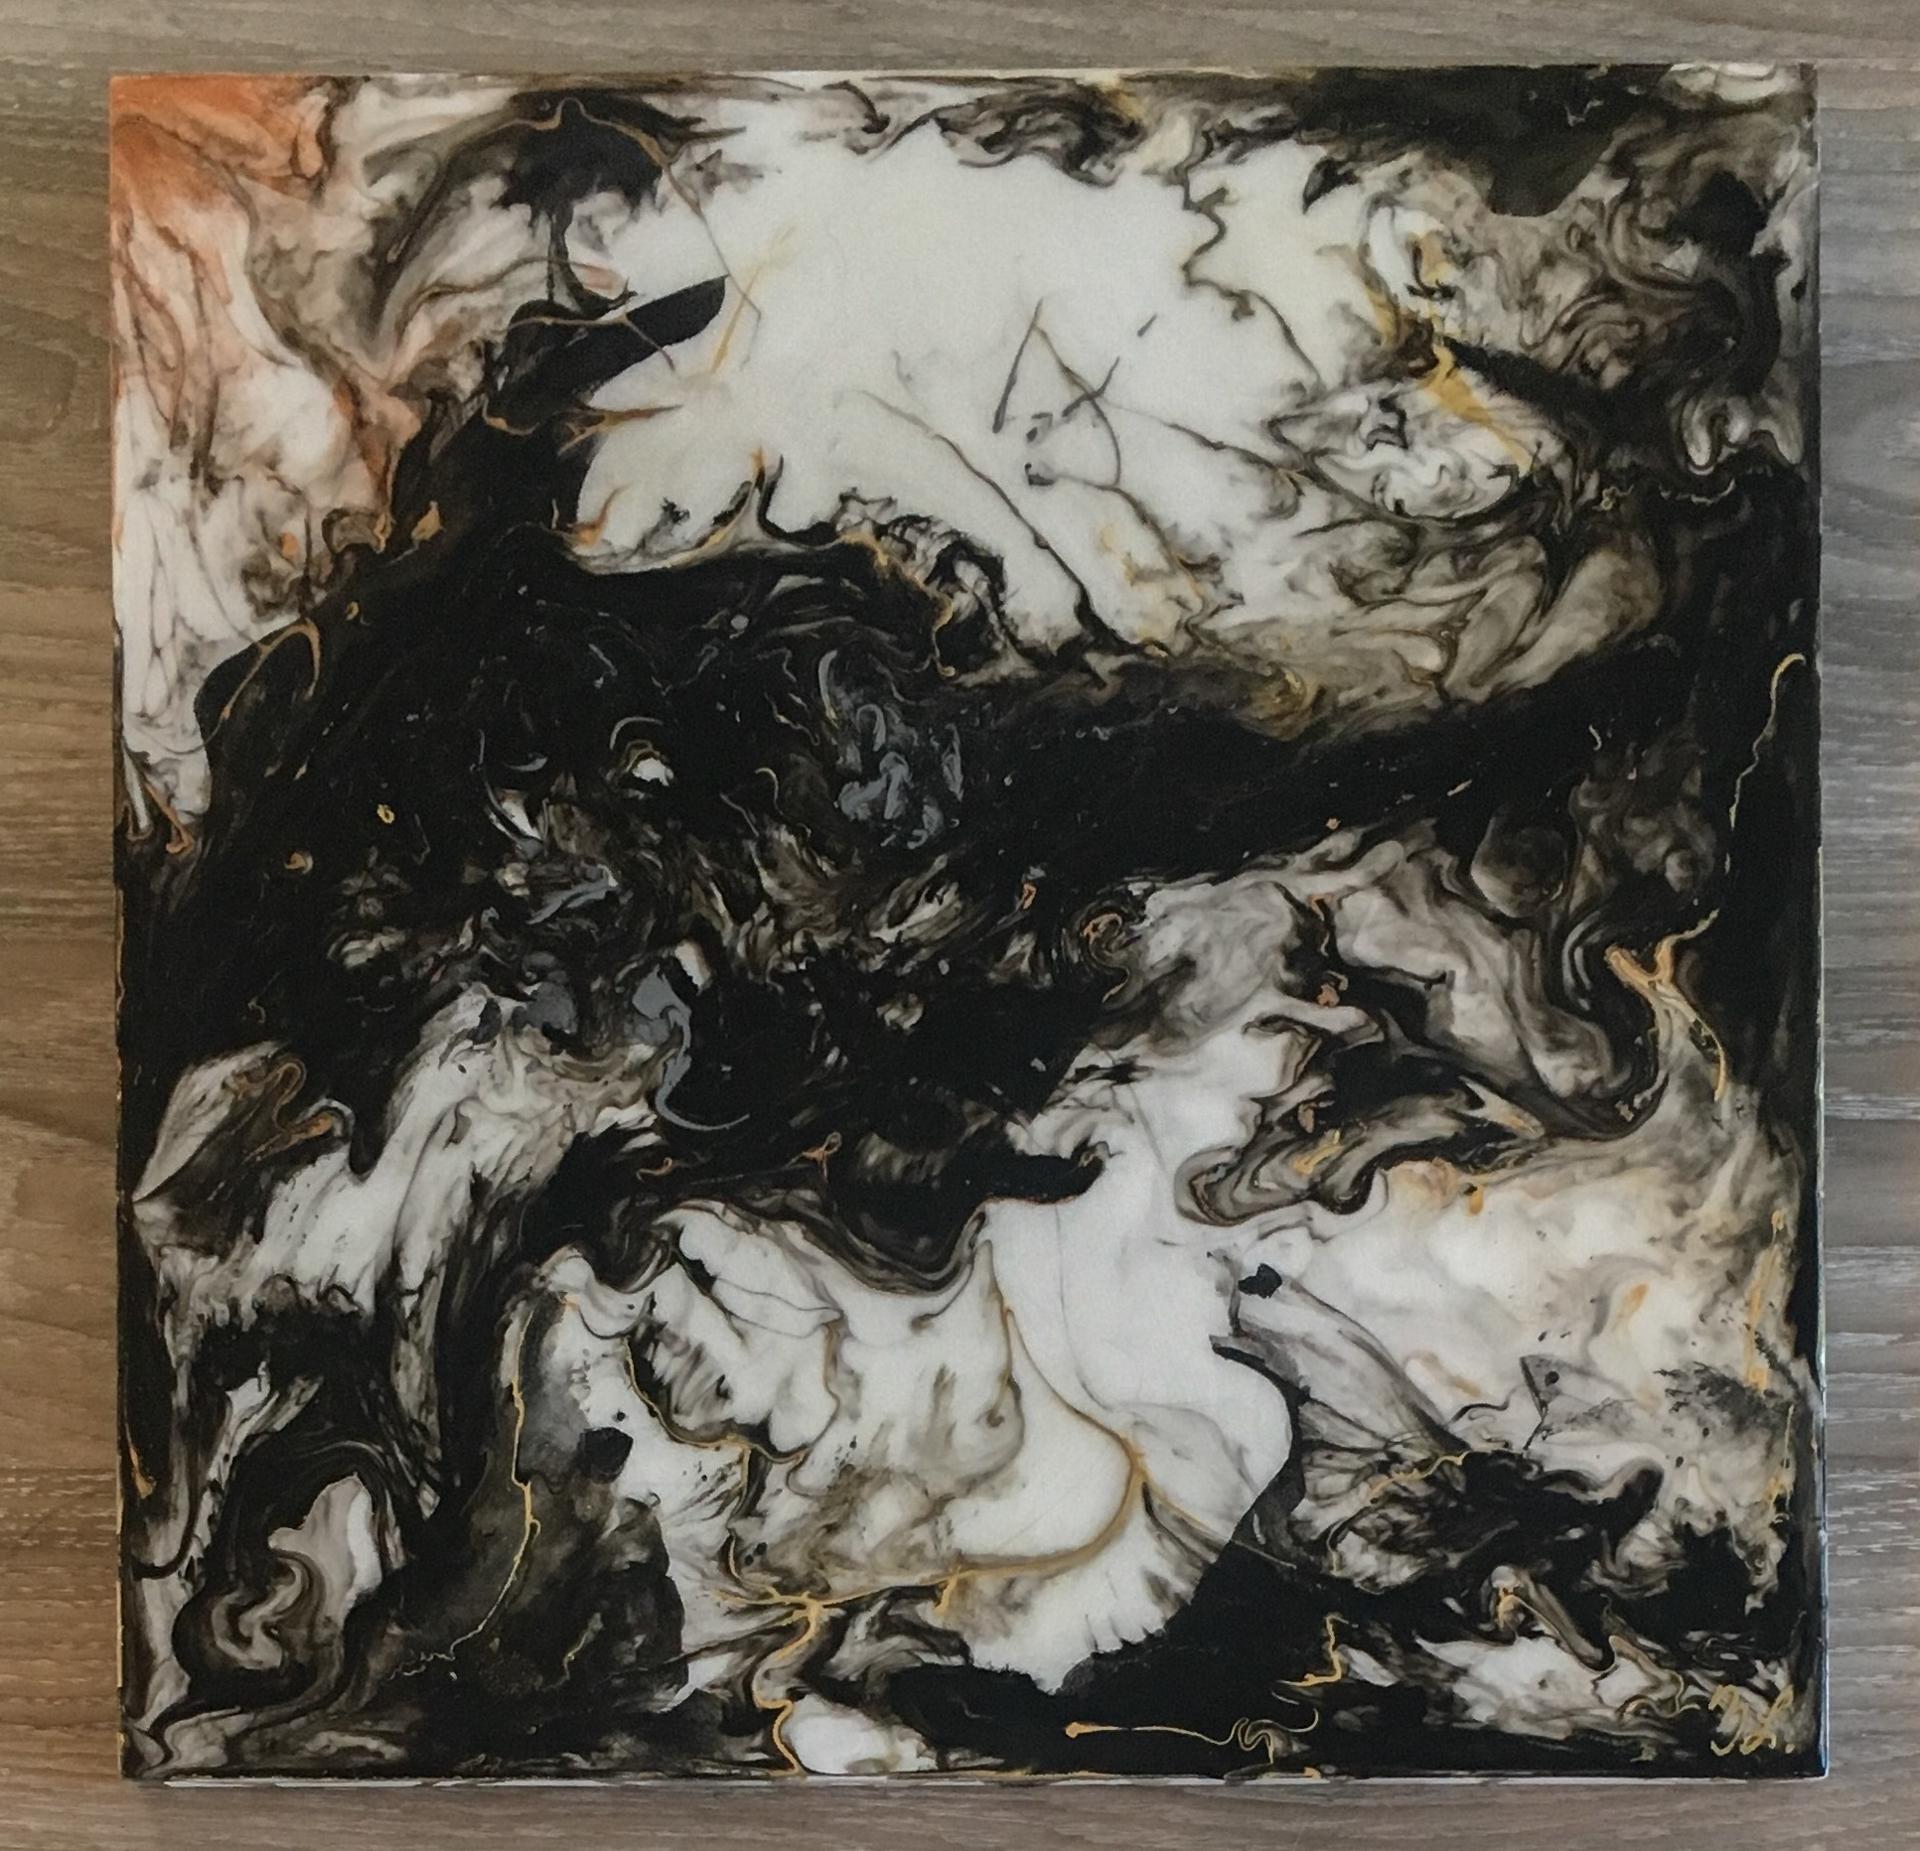 Elements Rising No. 5 by Lisa Ledson